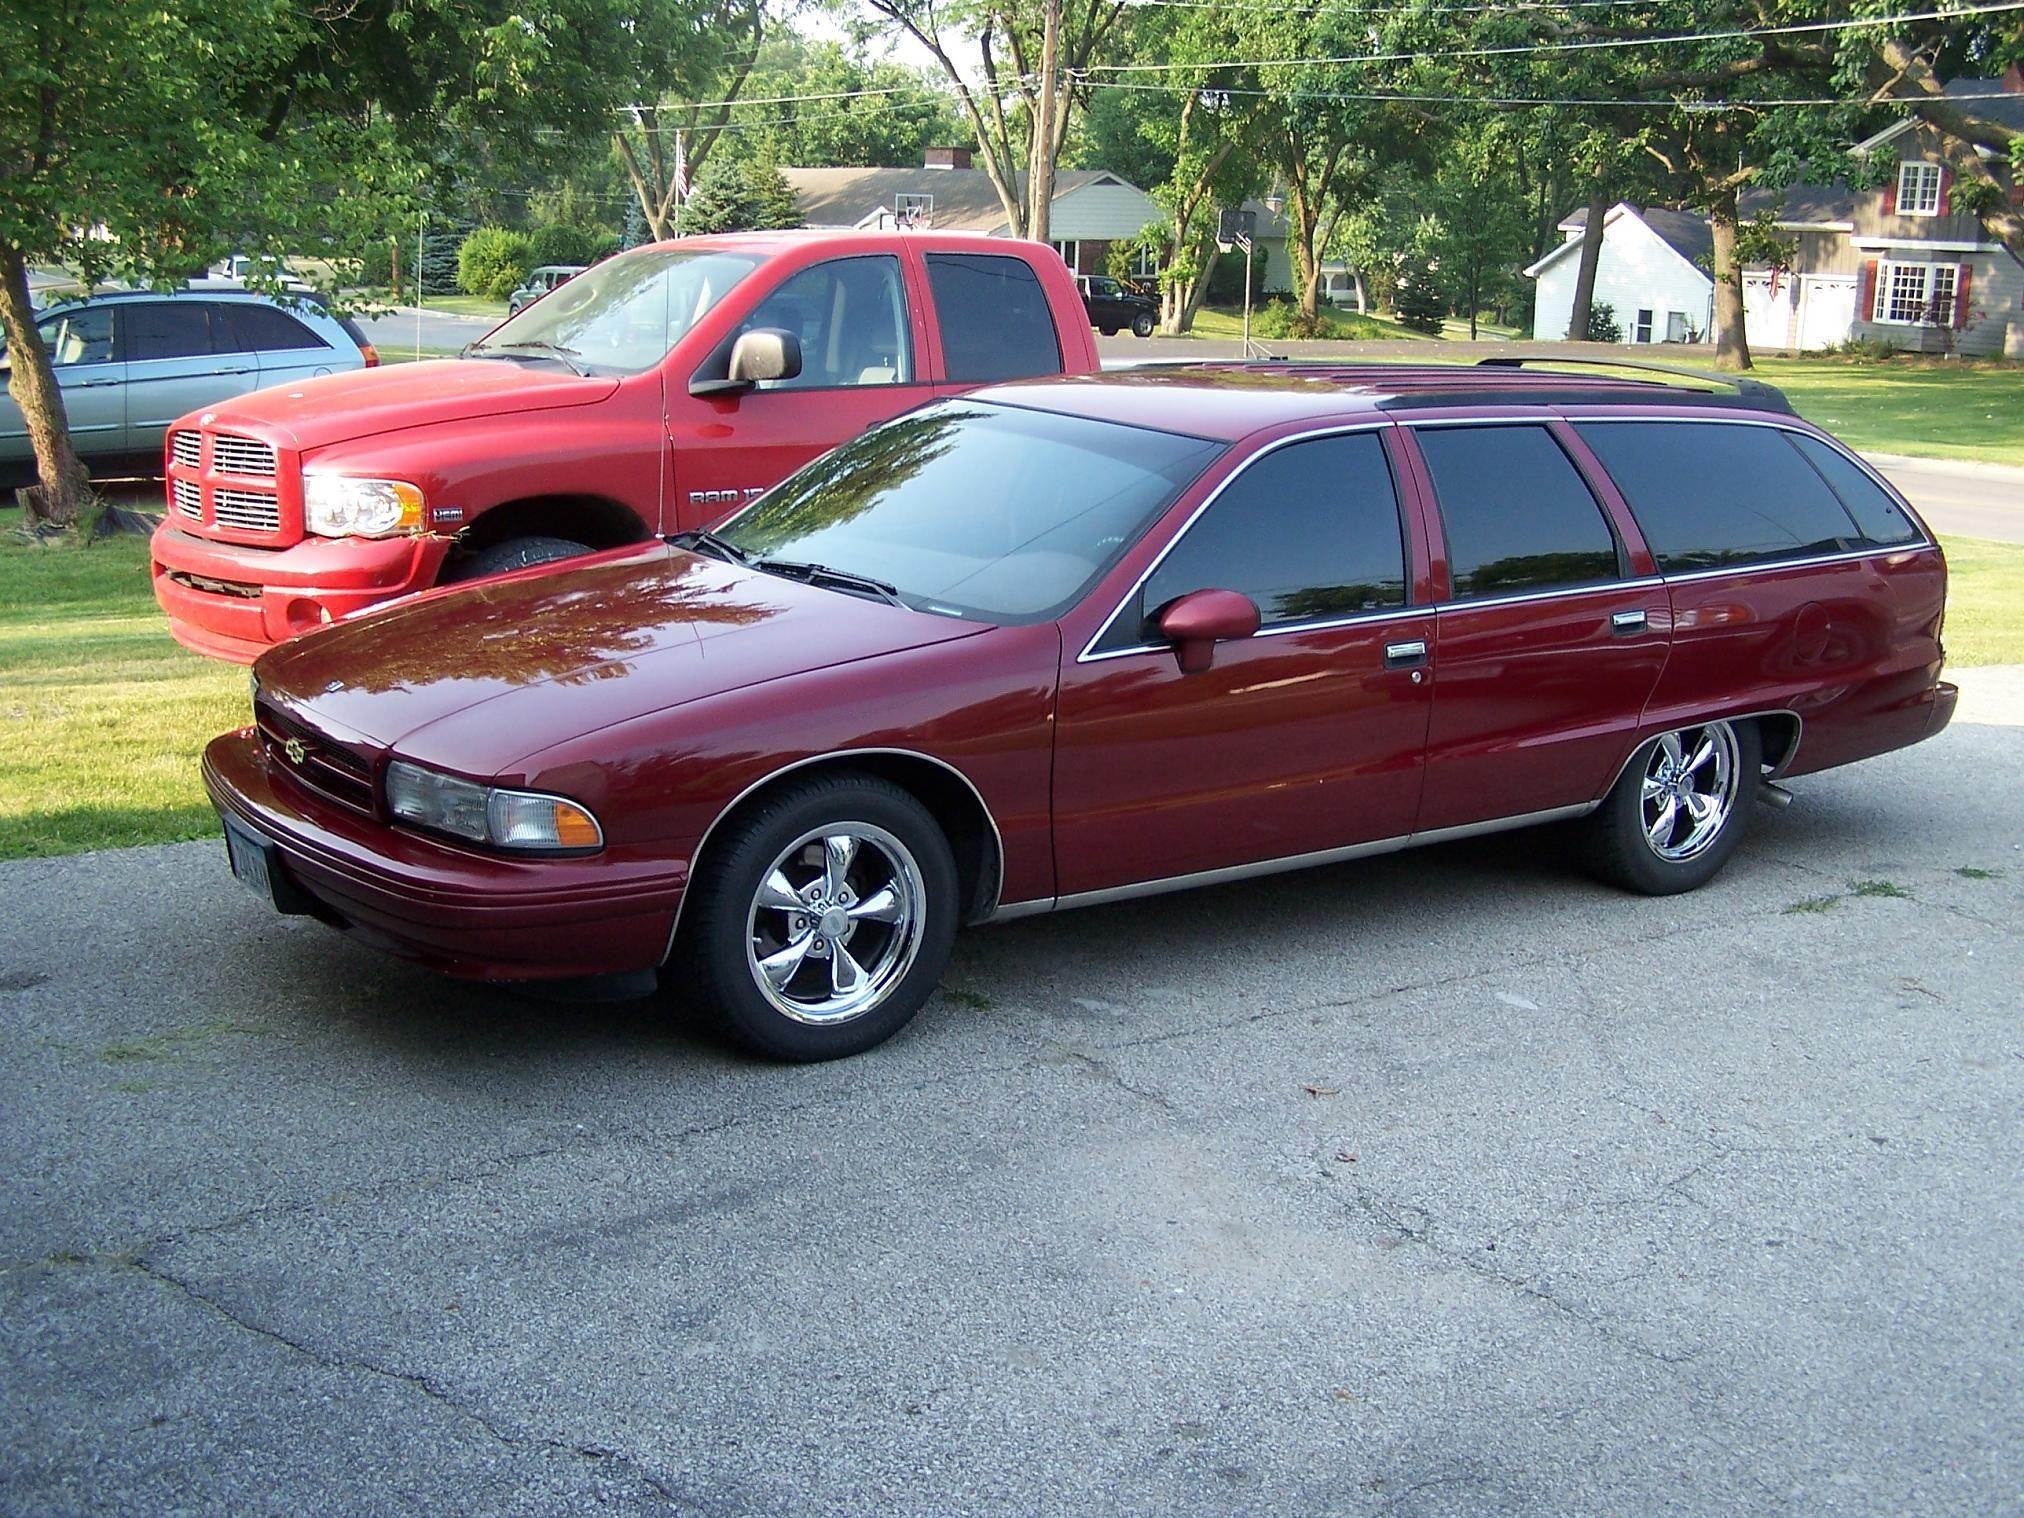 94 caprice wagon http mrimpalasautoparts com 91 94 chevy caprice wagons pinterest chevy